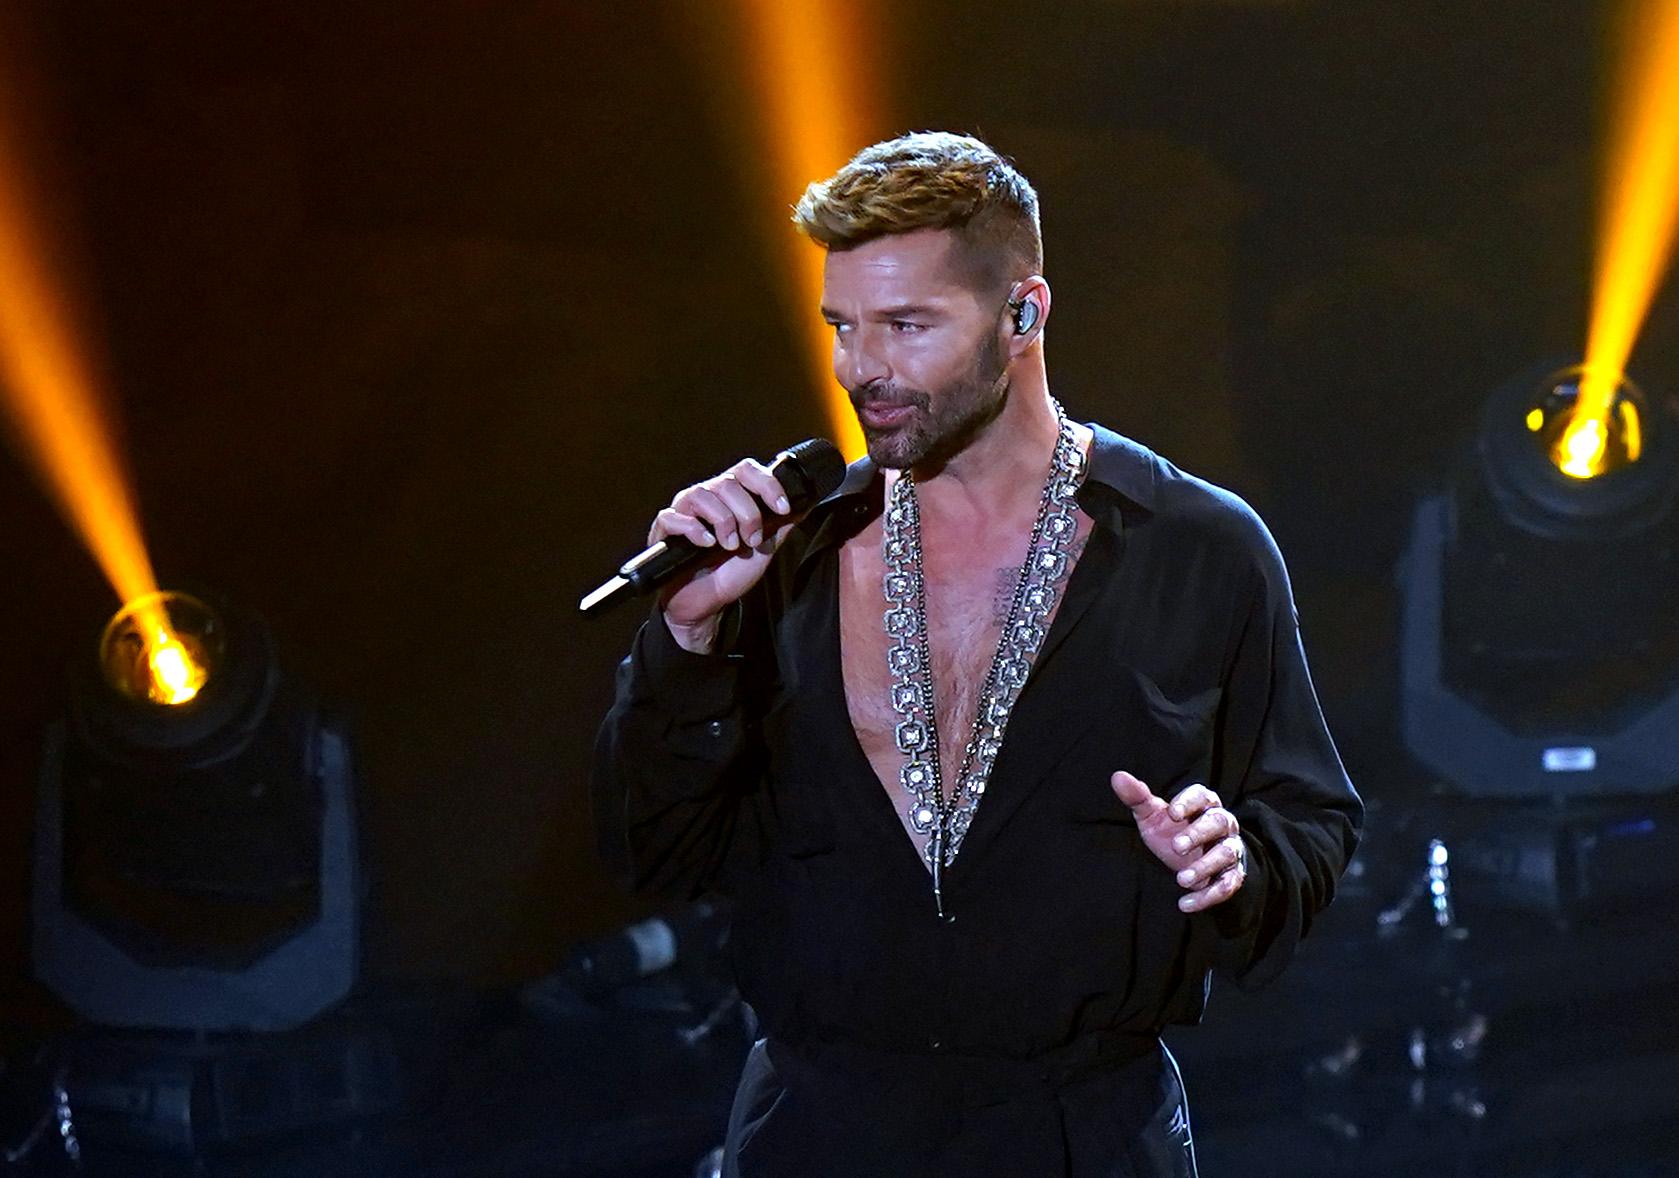 Ricky Martin performs at the 2020 Latin GRAMMY Awards in Miami, Florida.